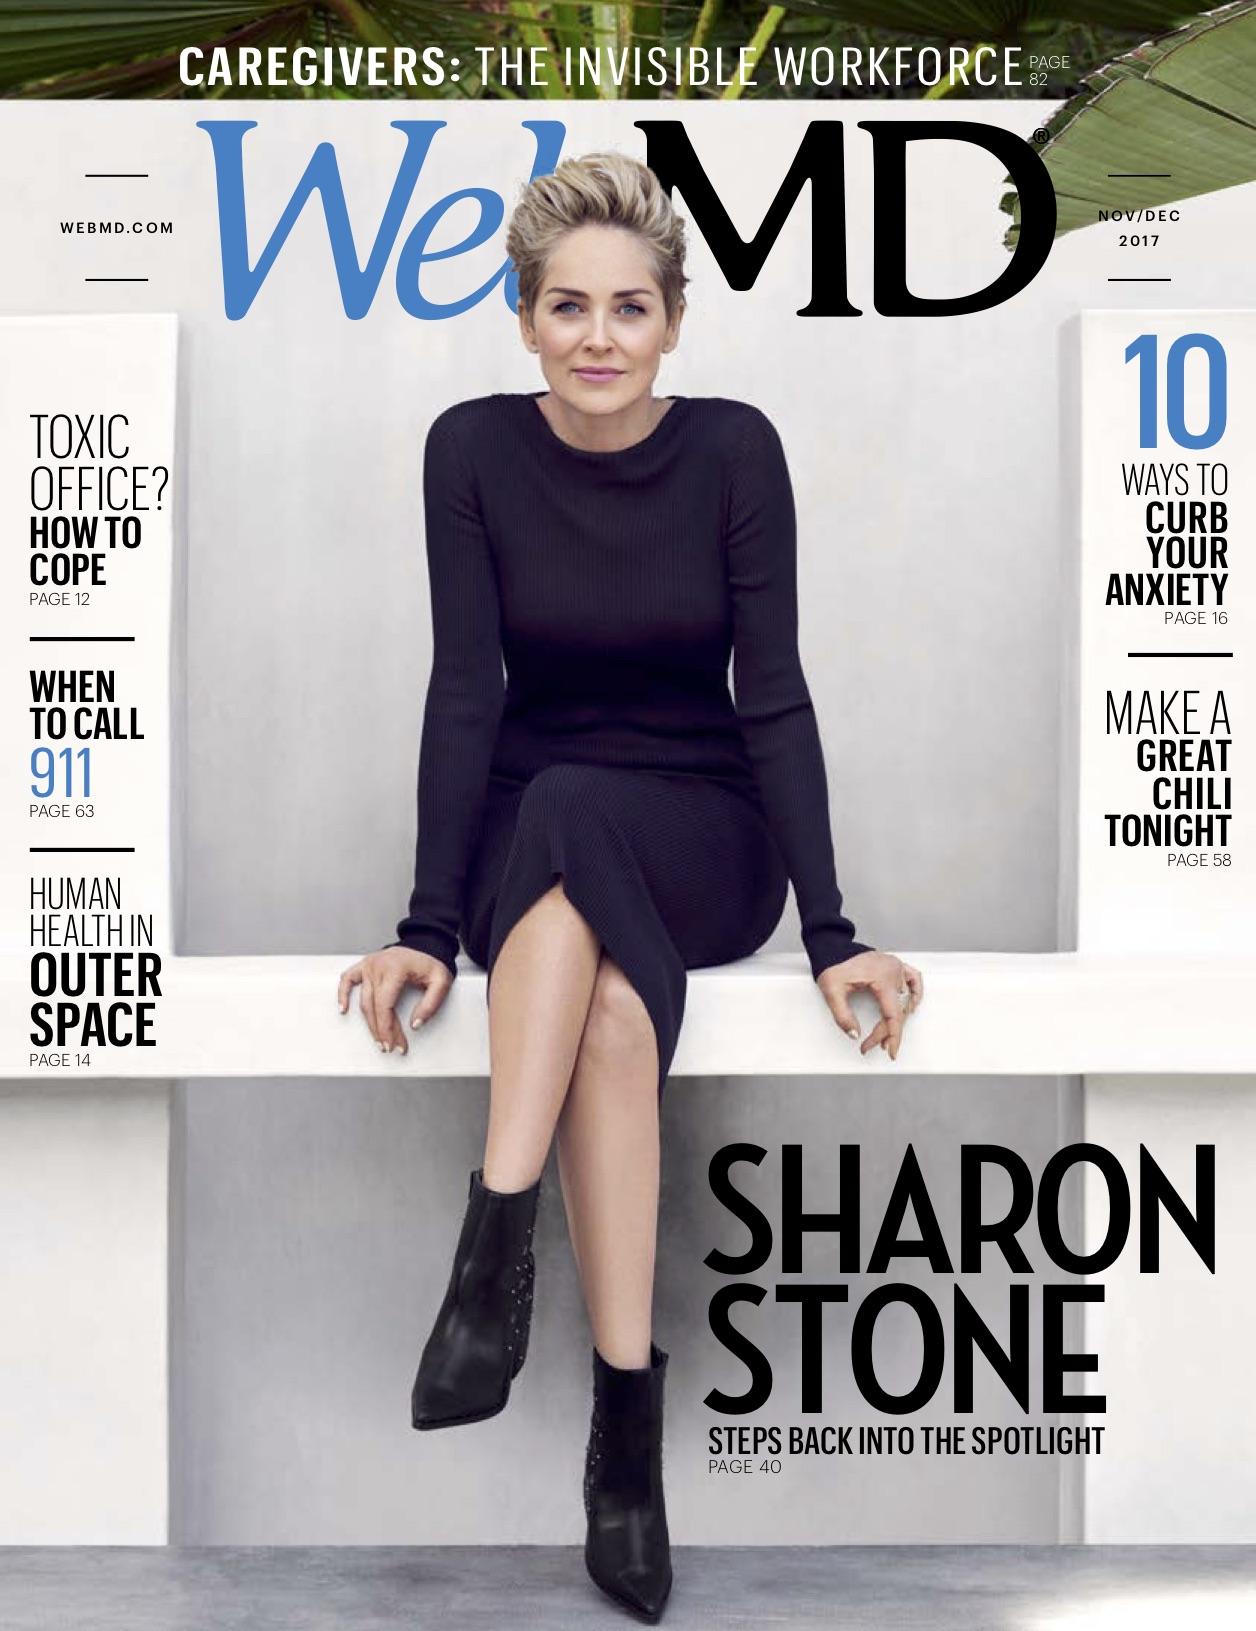 Sharon Stone JPEG 1.jpg